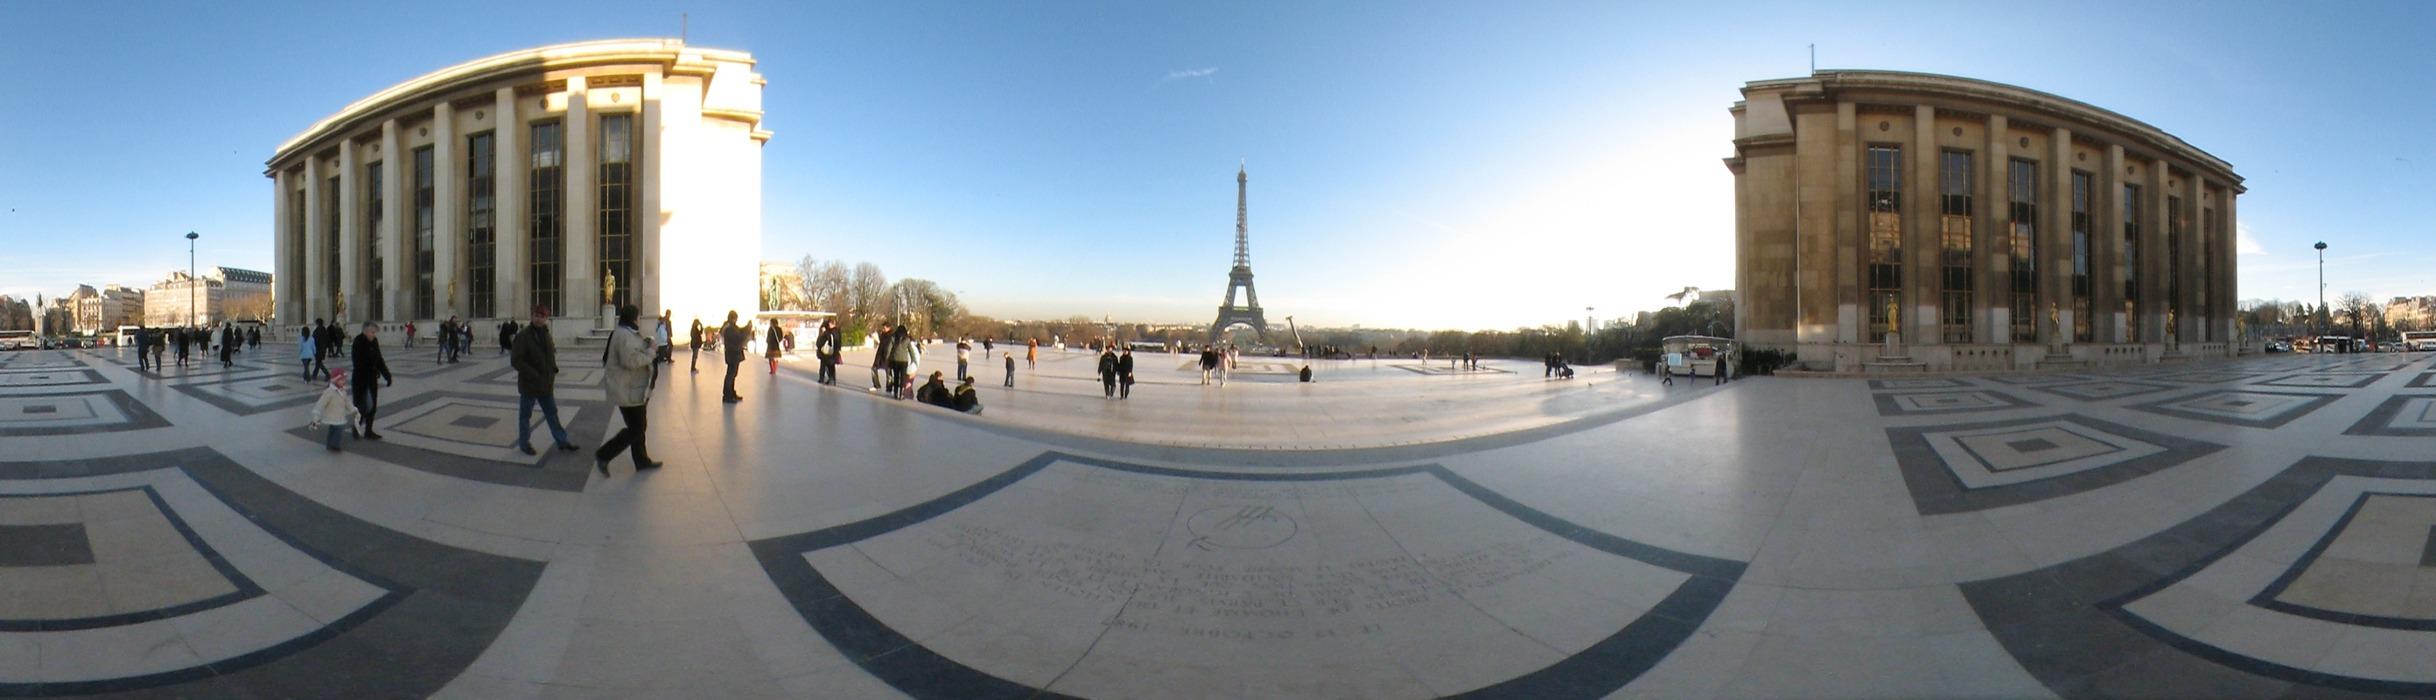 0 360 panoramic optic: